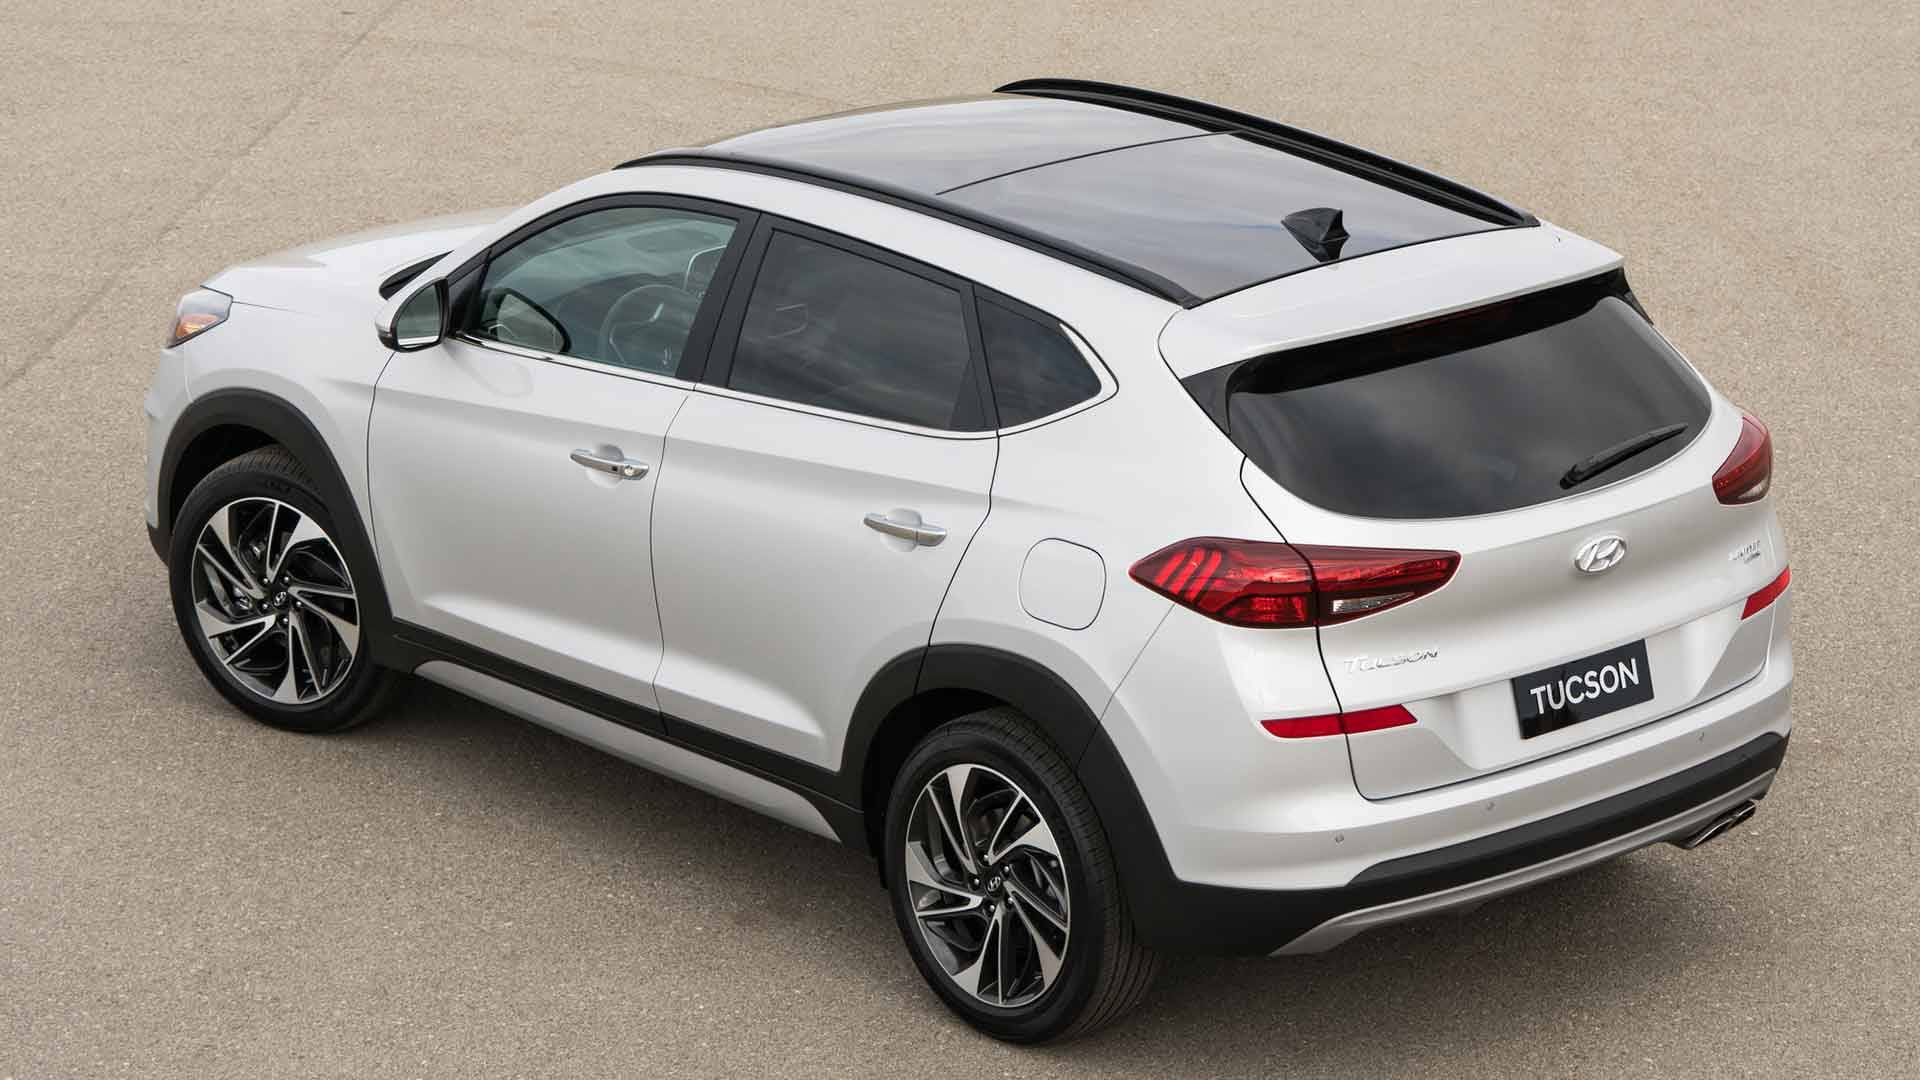 Vwvortex Com 2019 Hyundai Tucson Arrives With Major